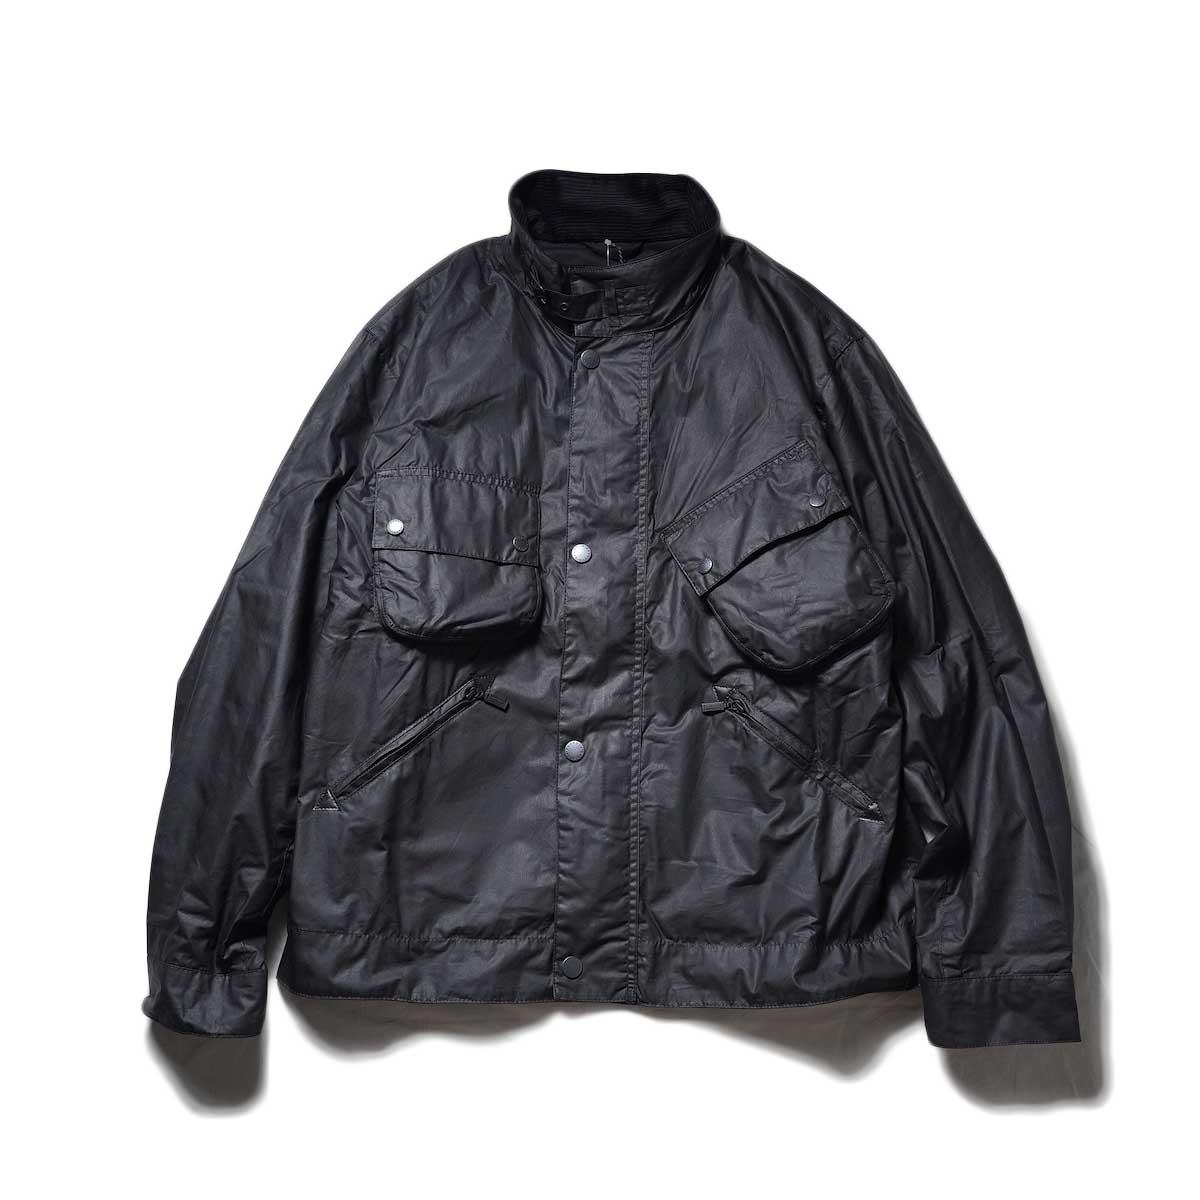 Engineered Garments / COVER VEST - NYLON MICRO RIPSTOP (Black)